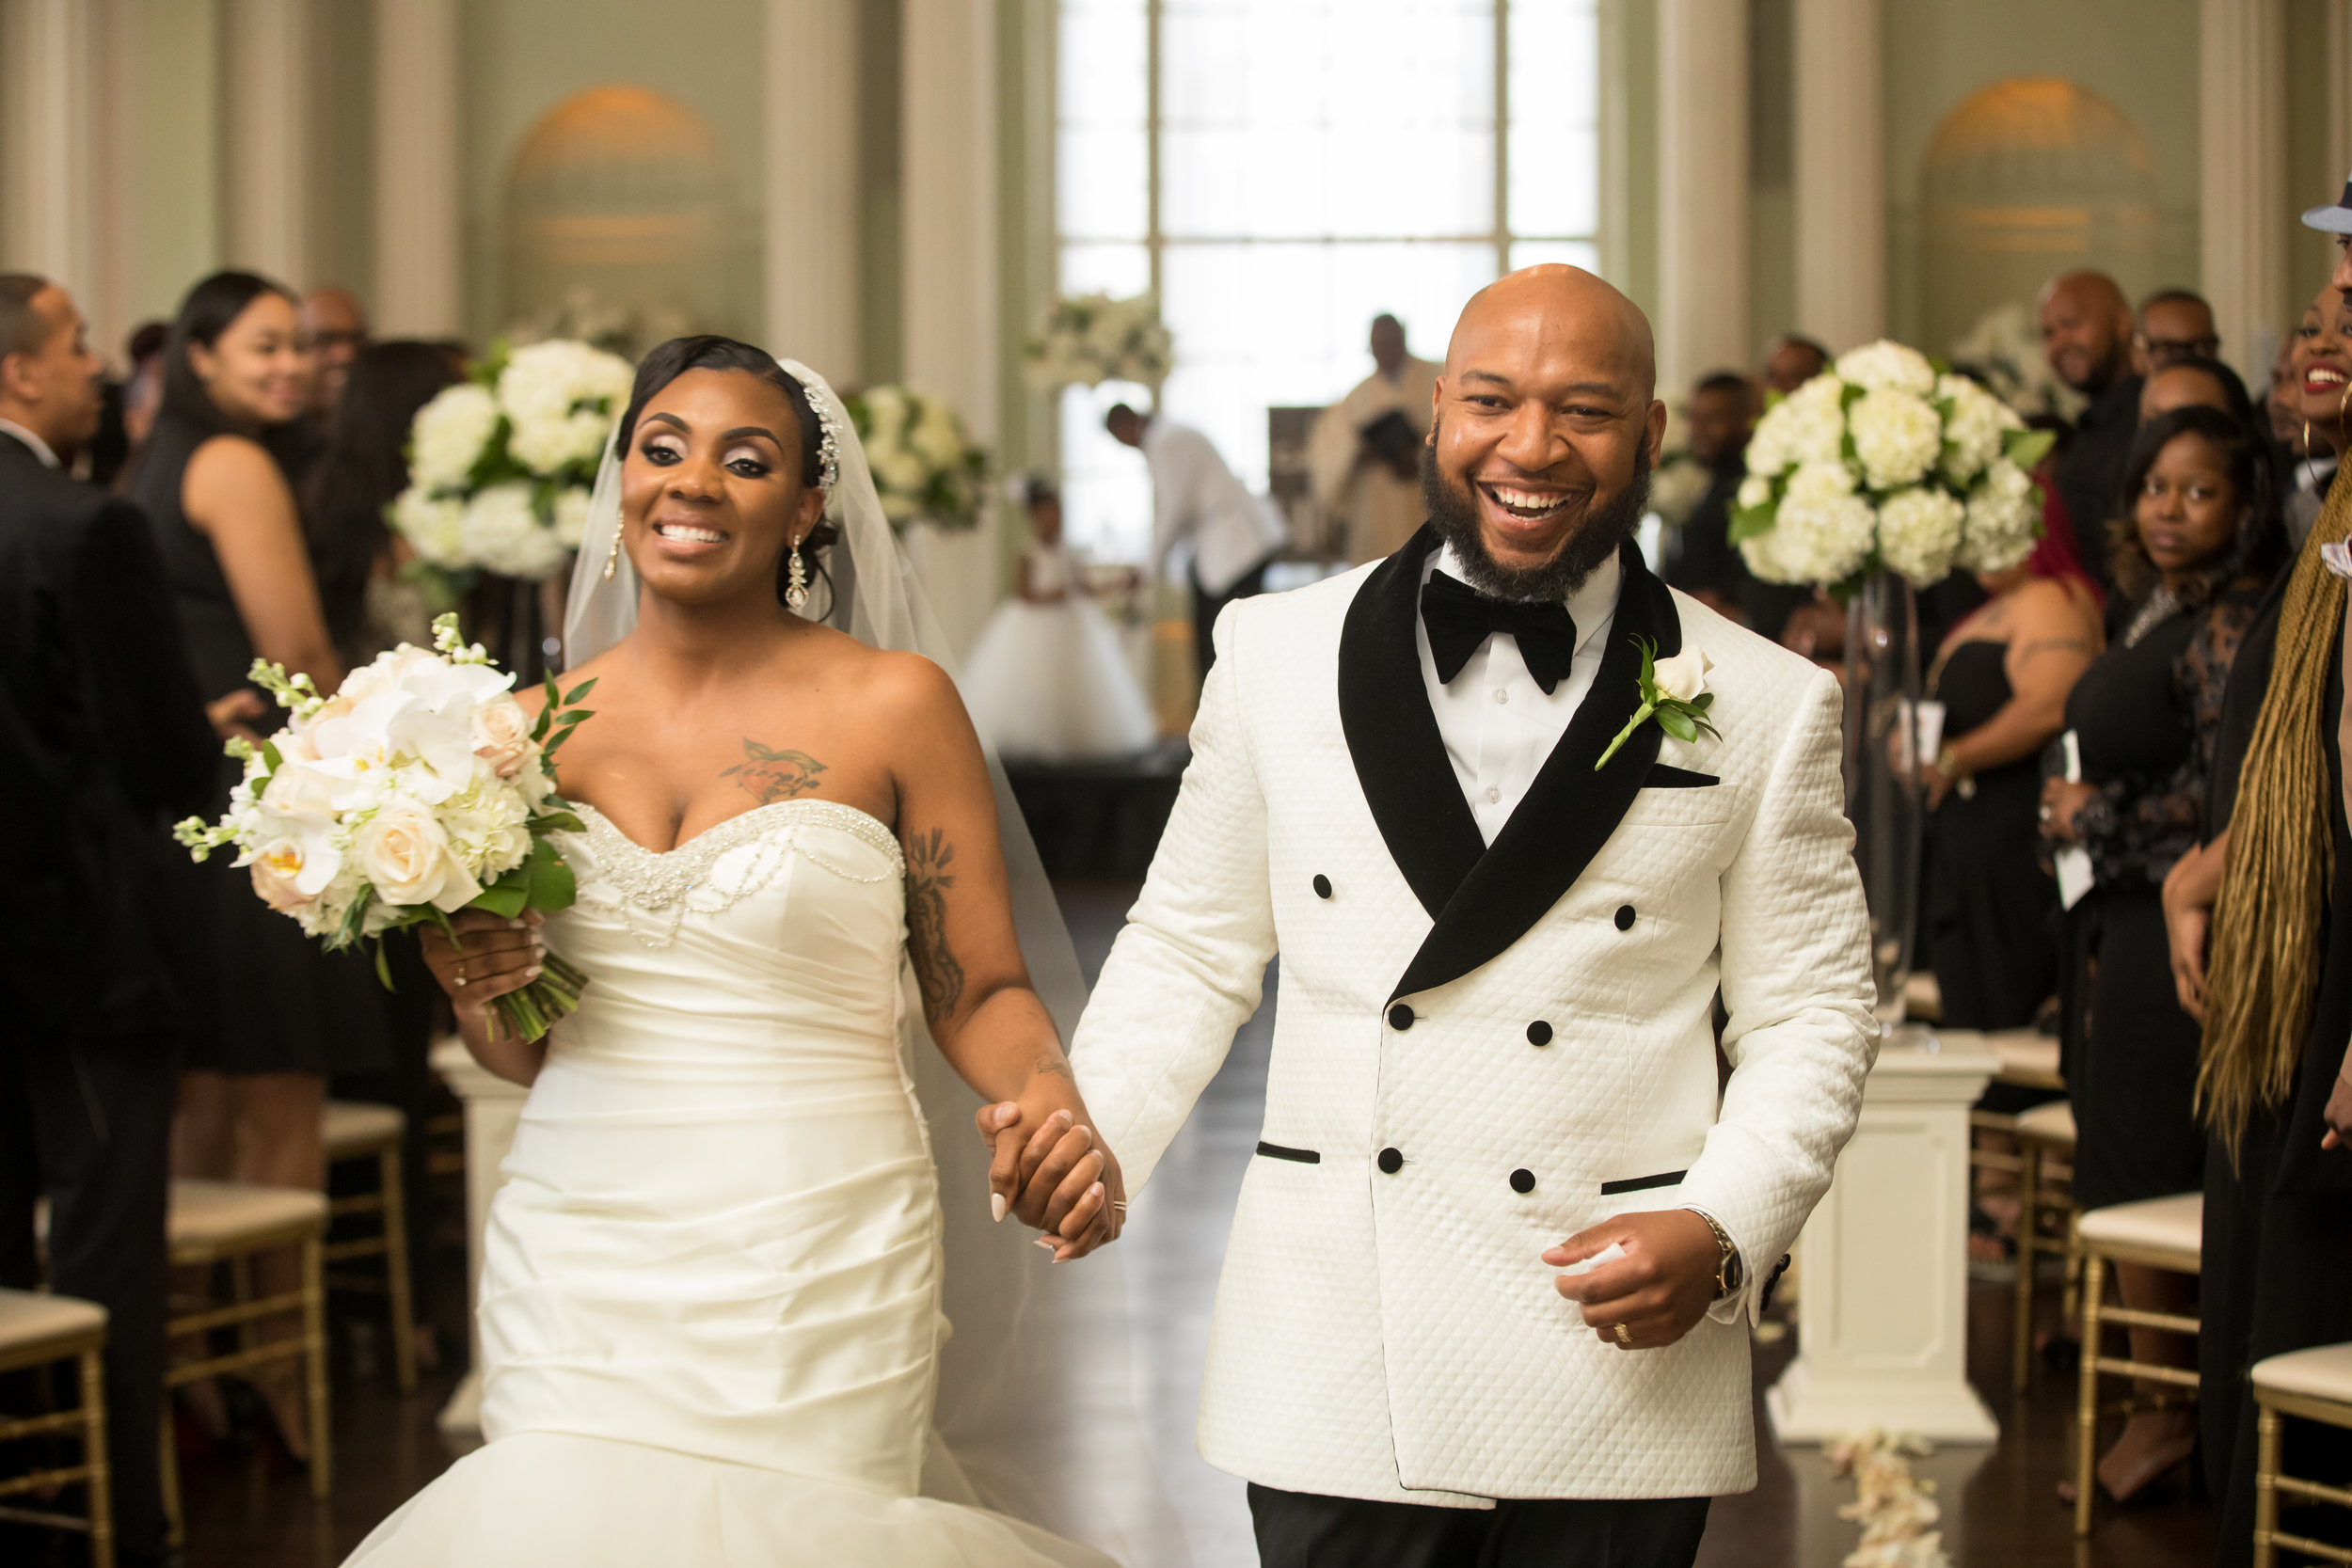 The-Biltmore-Wedding-Rene-Jamison_Cains_Camera_Atlanta_Photography_39.jpg